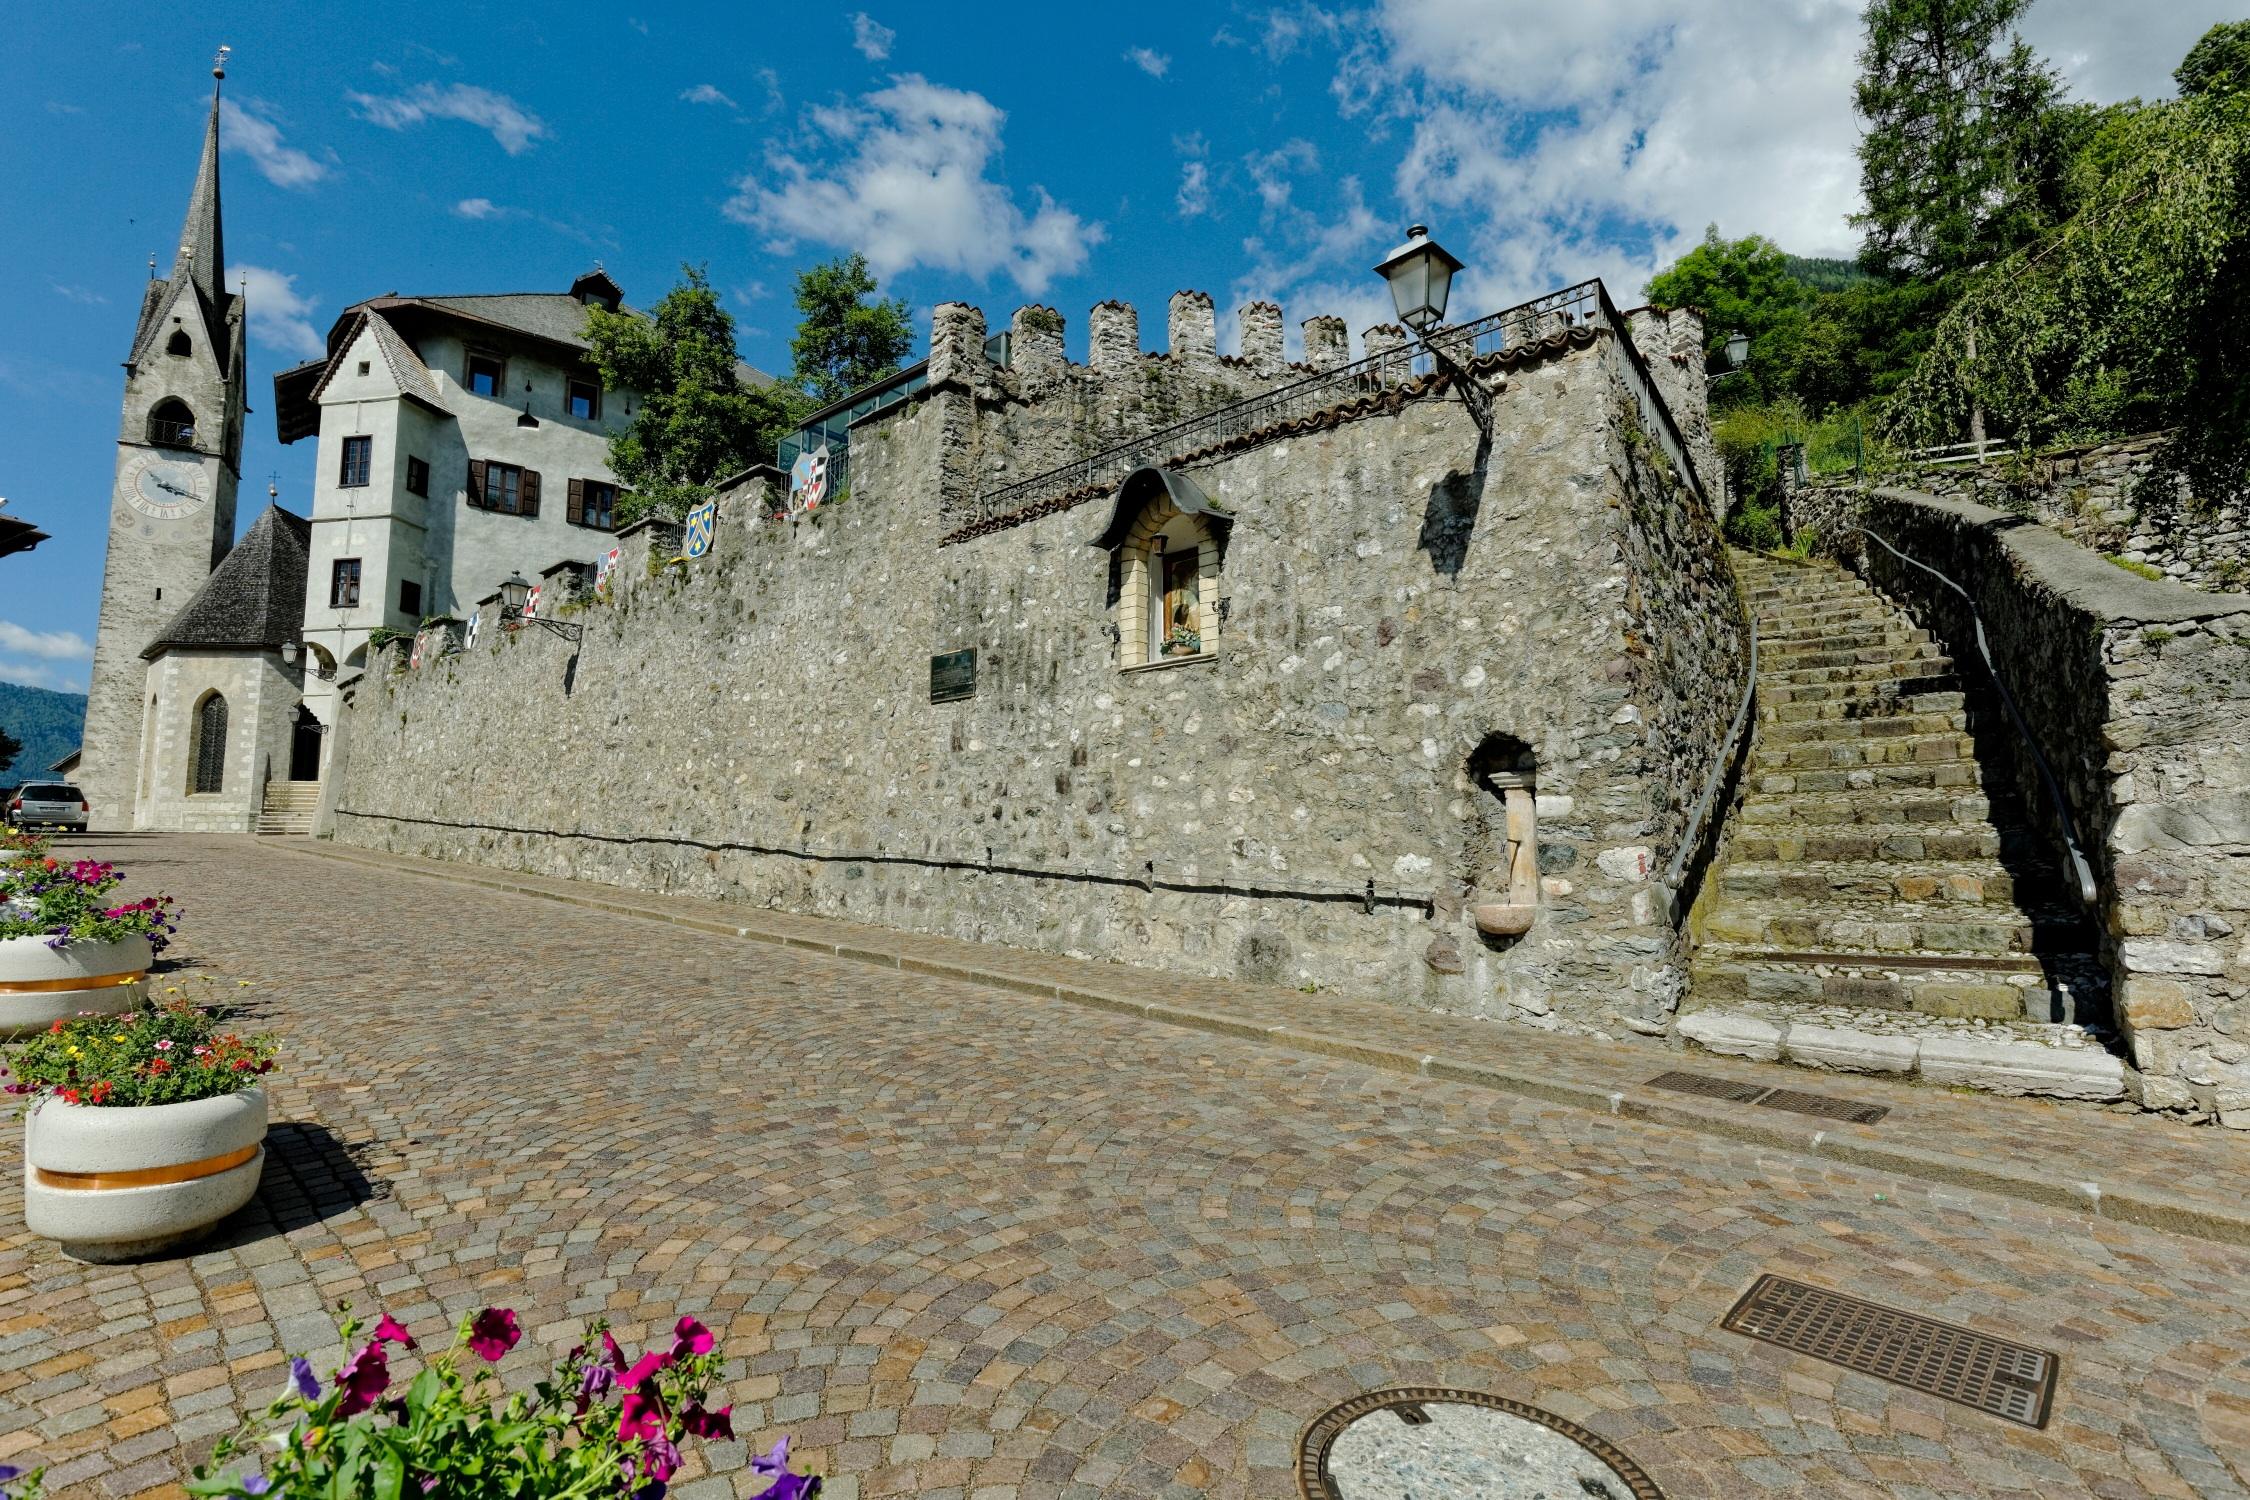 Palace of Mining - Fiera di Primiero...